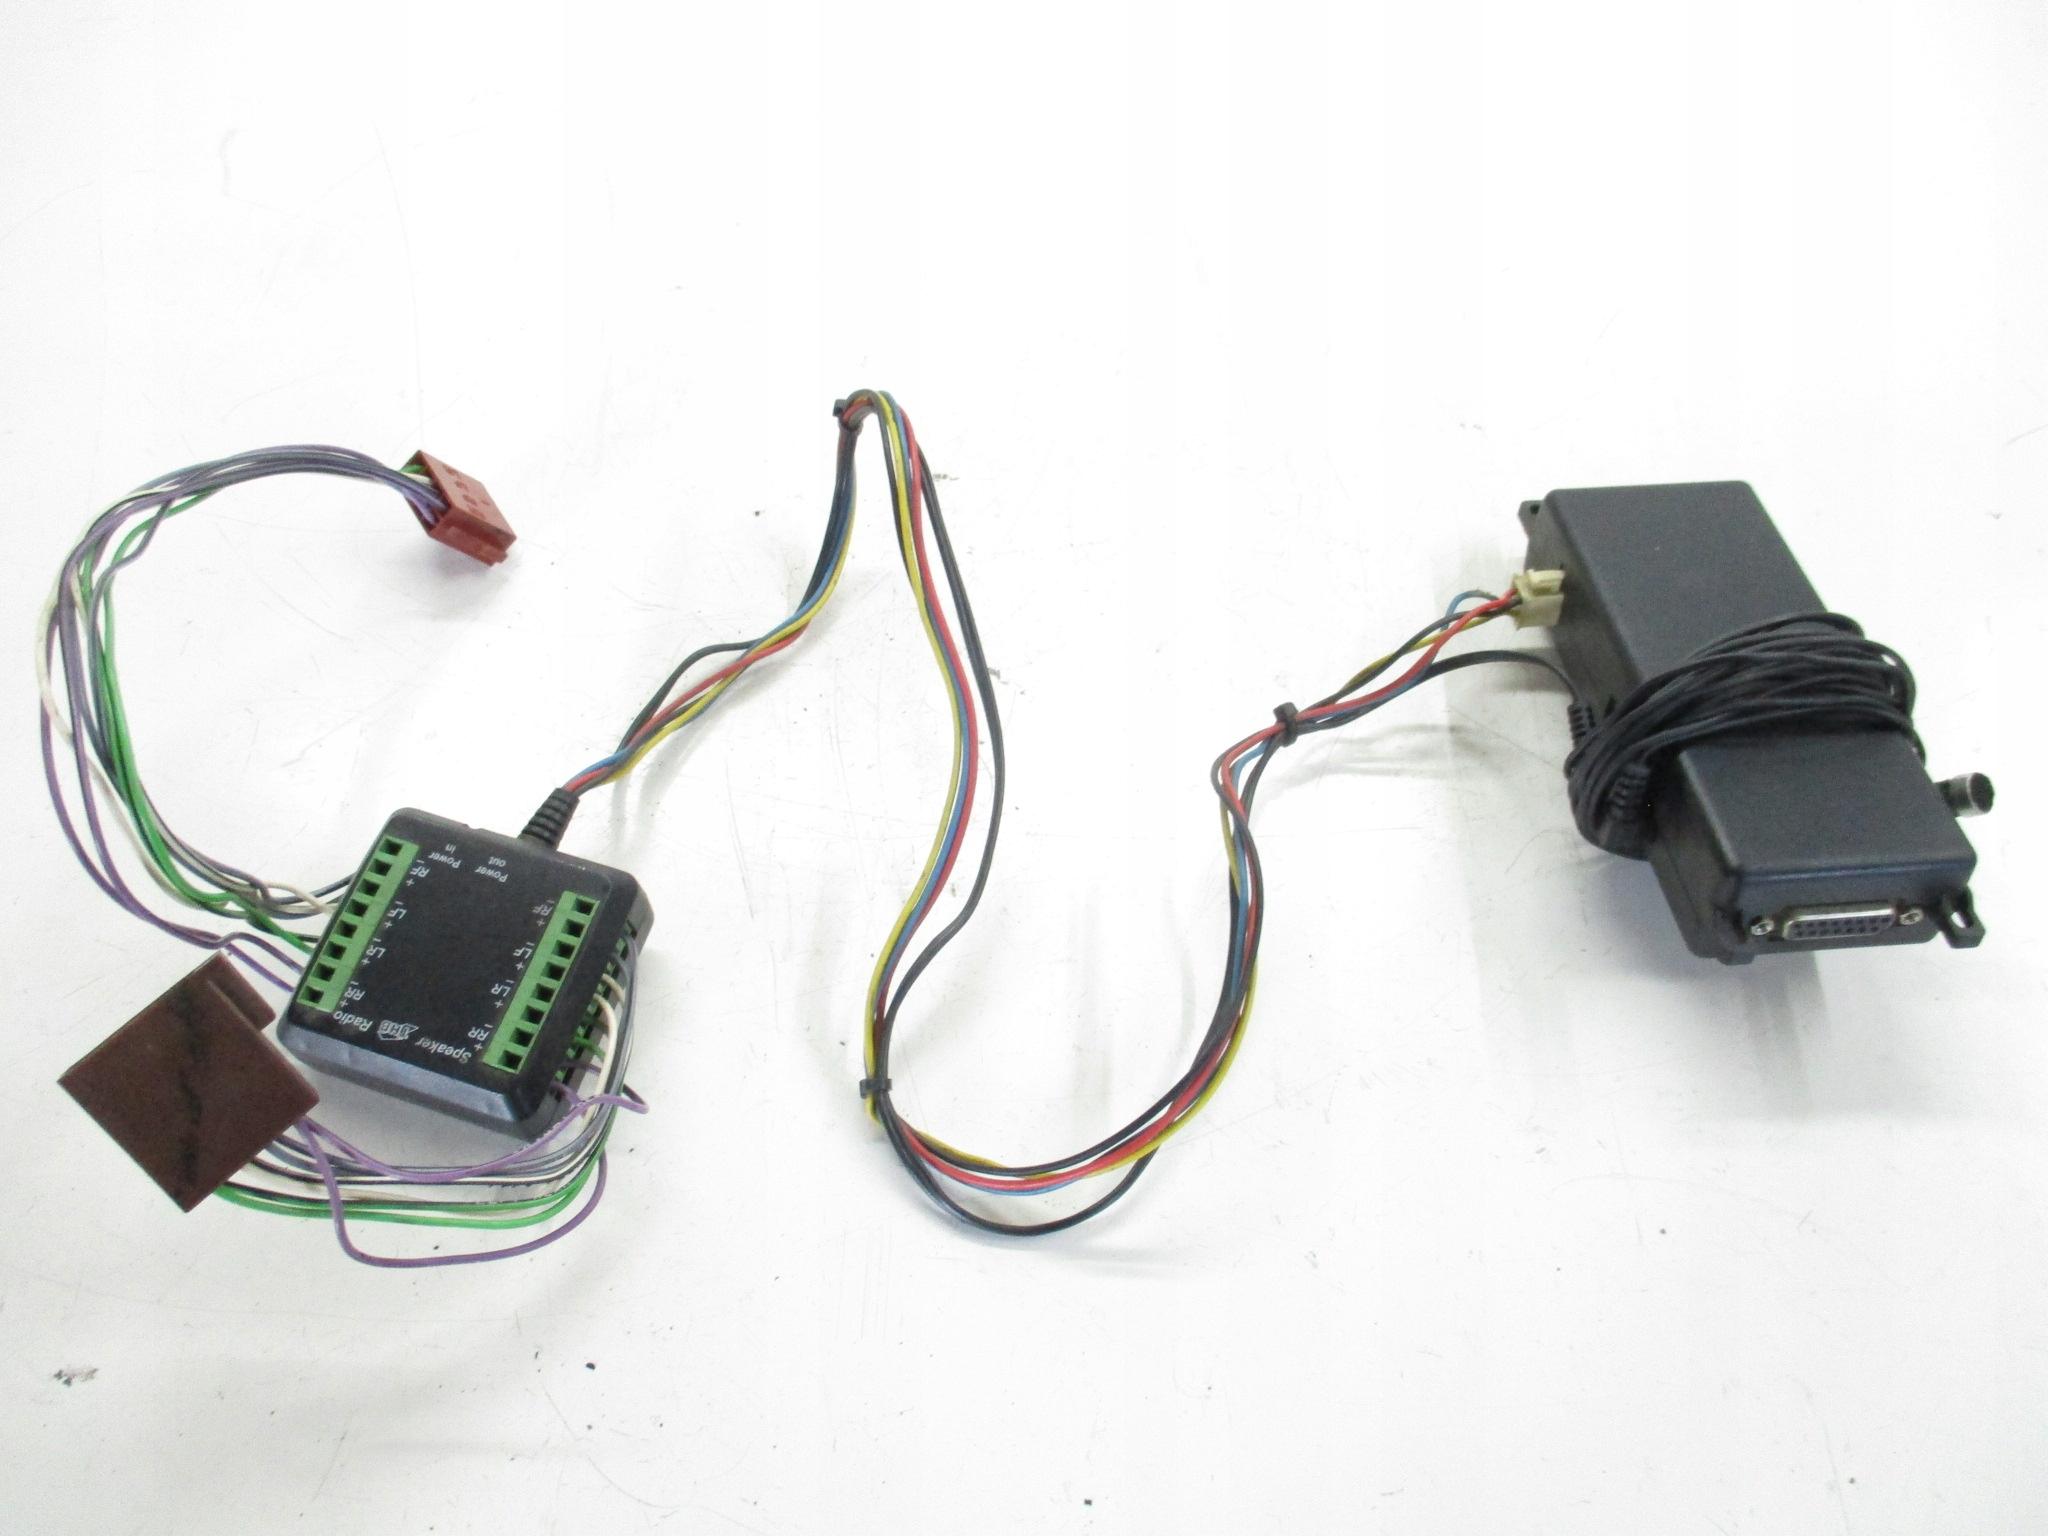 audi vw skoda комплект громкой связи компьютер